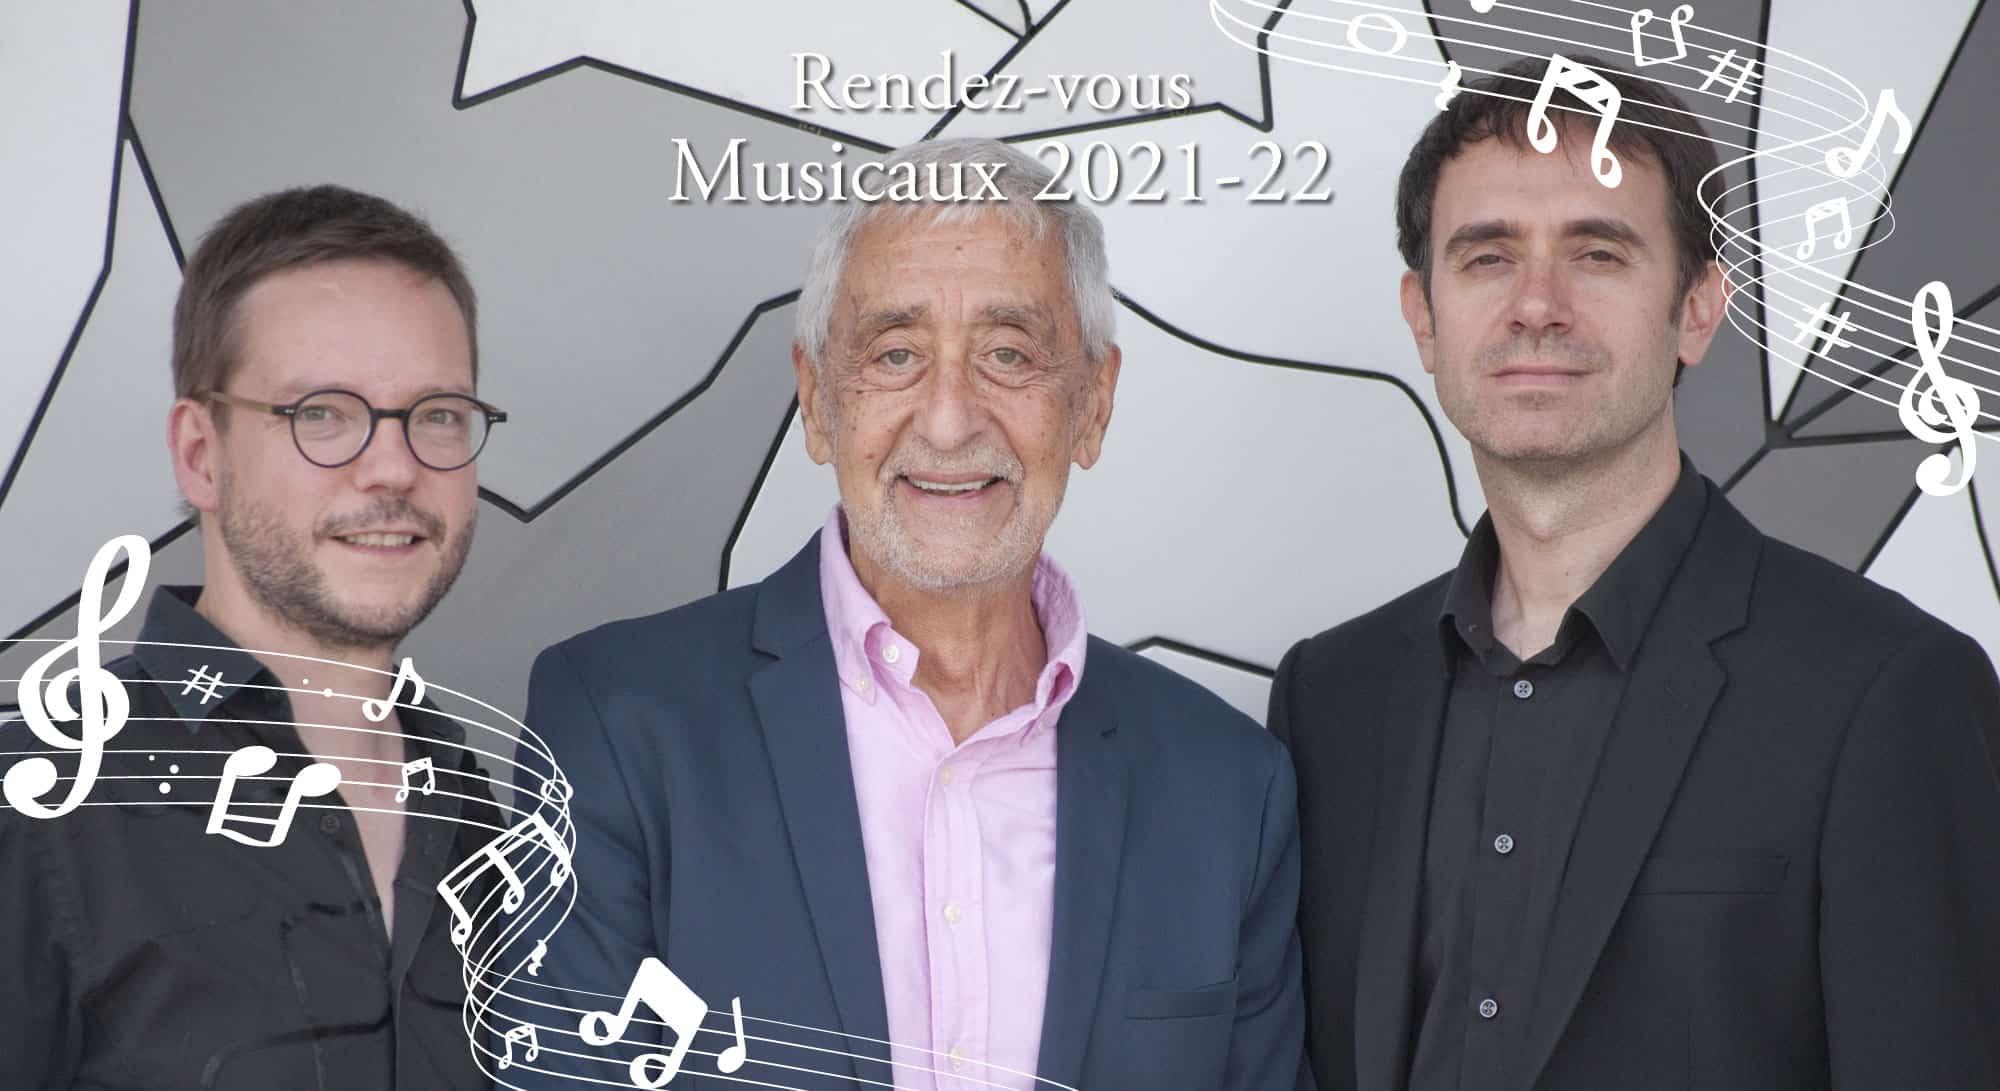 Concert Tango - Piazzola, Pugliese, Plaza, Troilo en Touraine